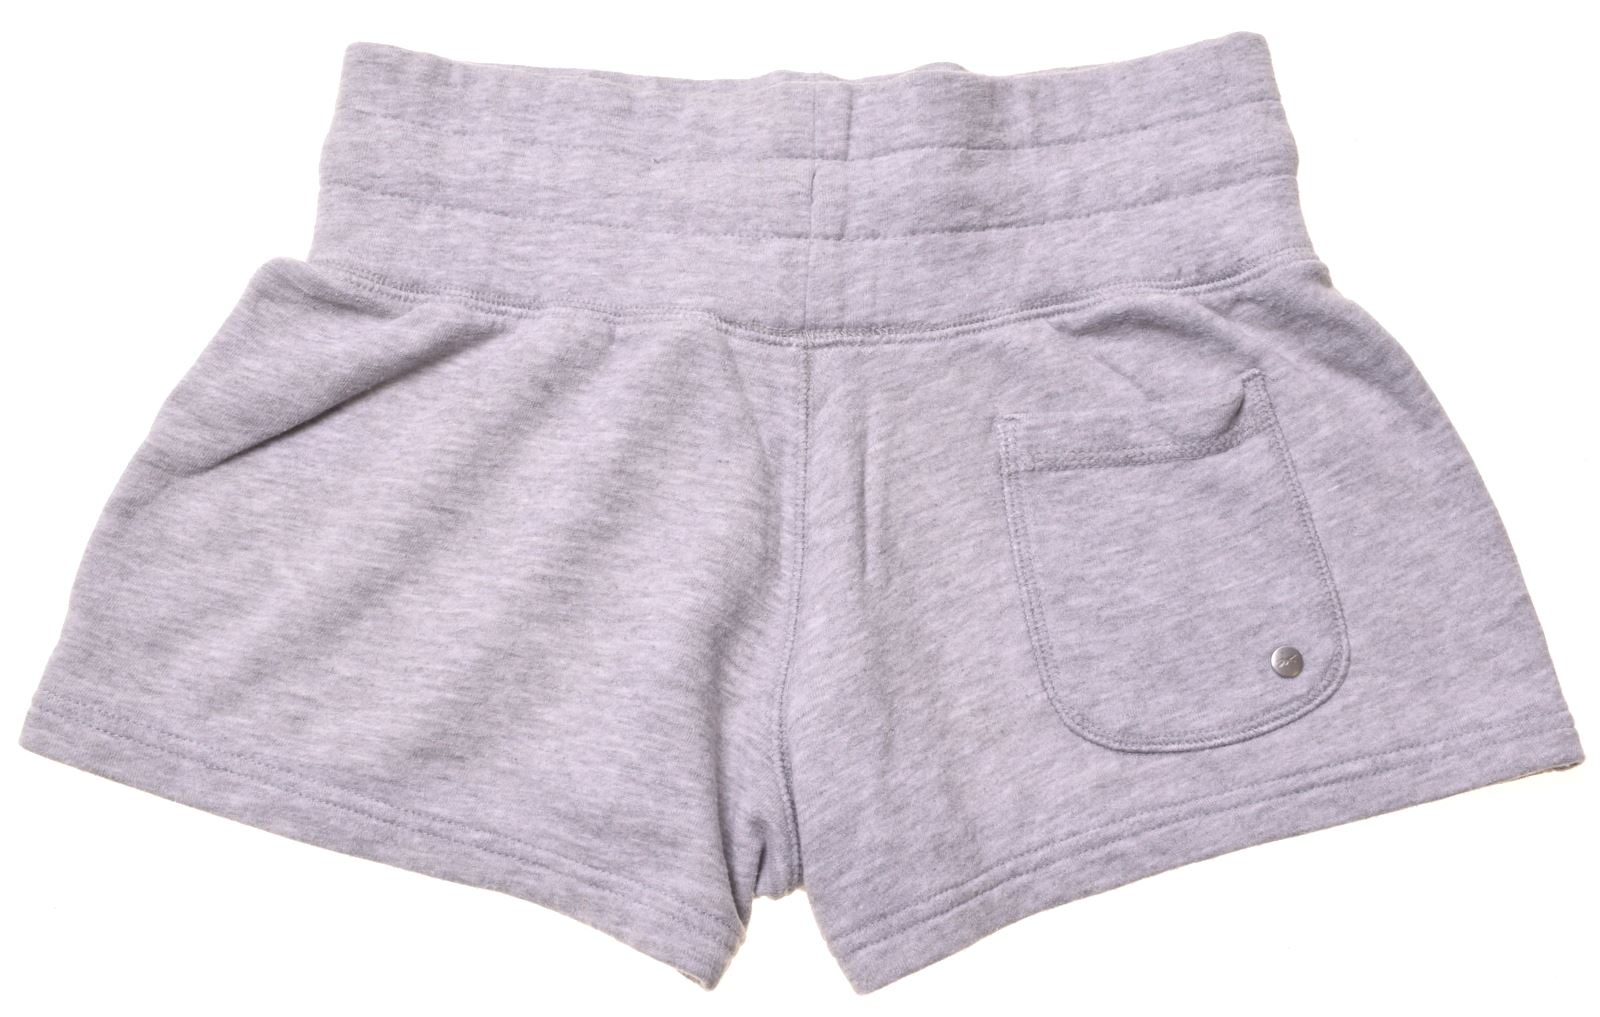 REEBOK Womens Sport Shorts UK 10 W26 Grey Cotton HO11 | eBay